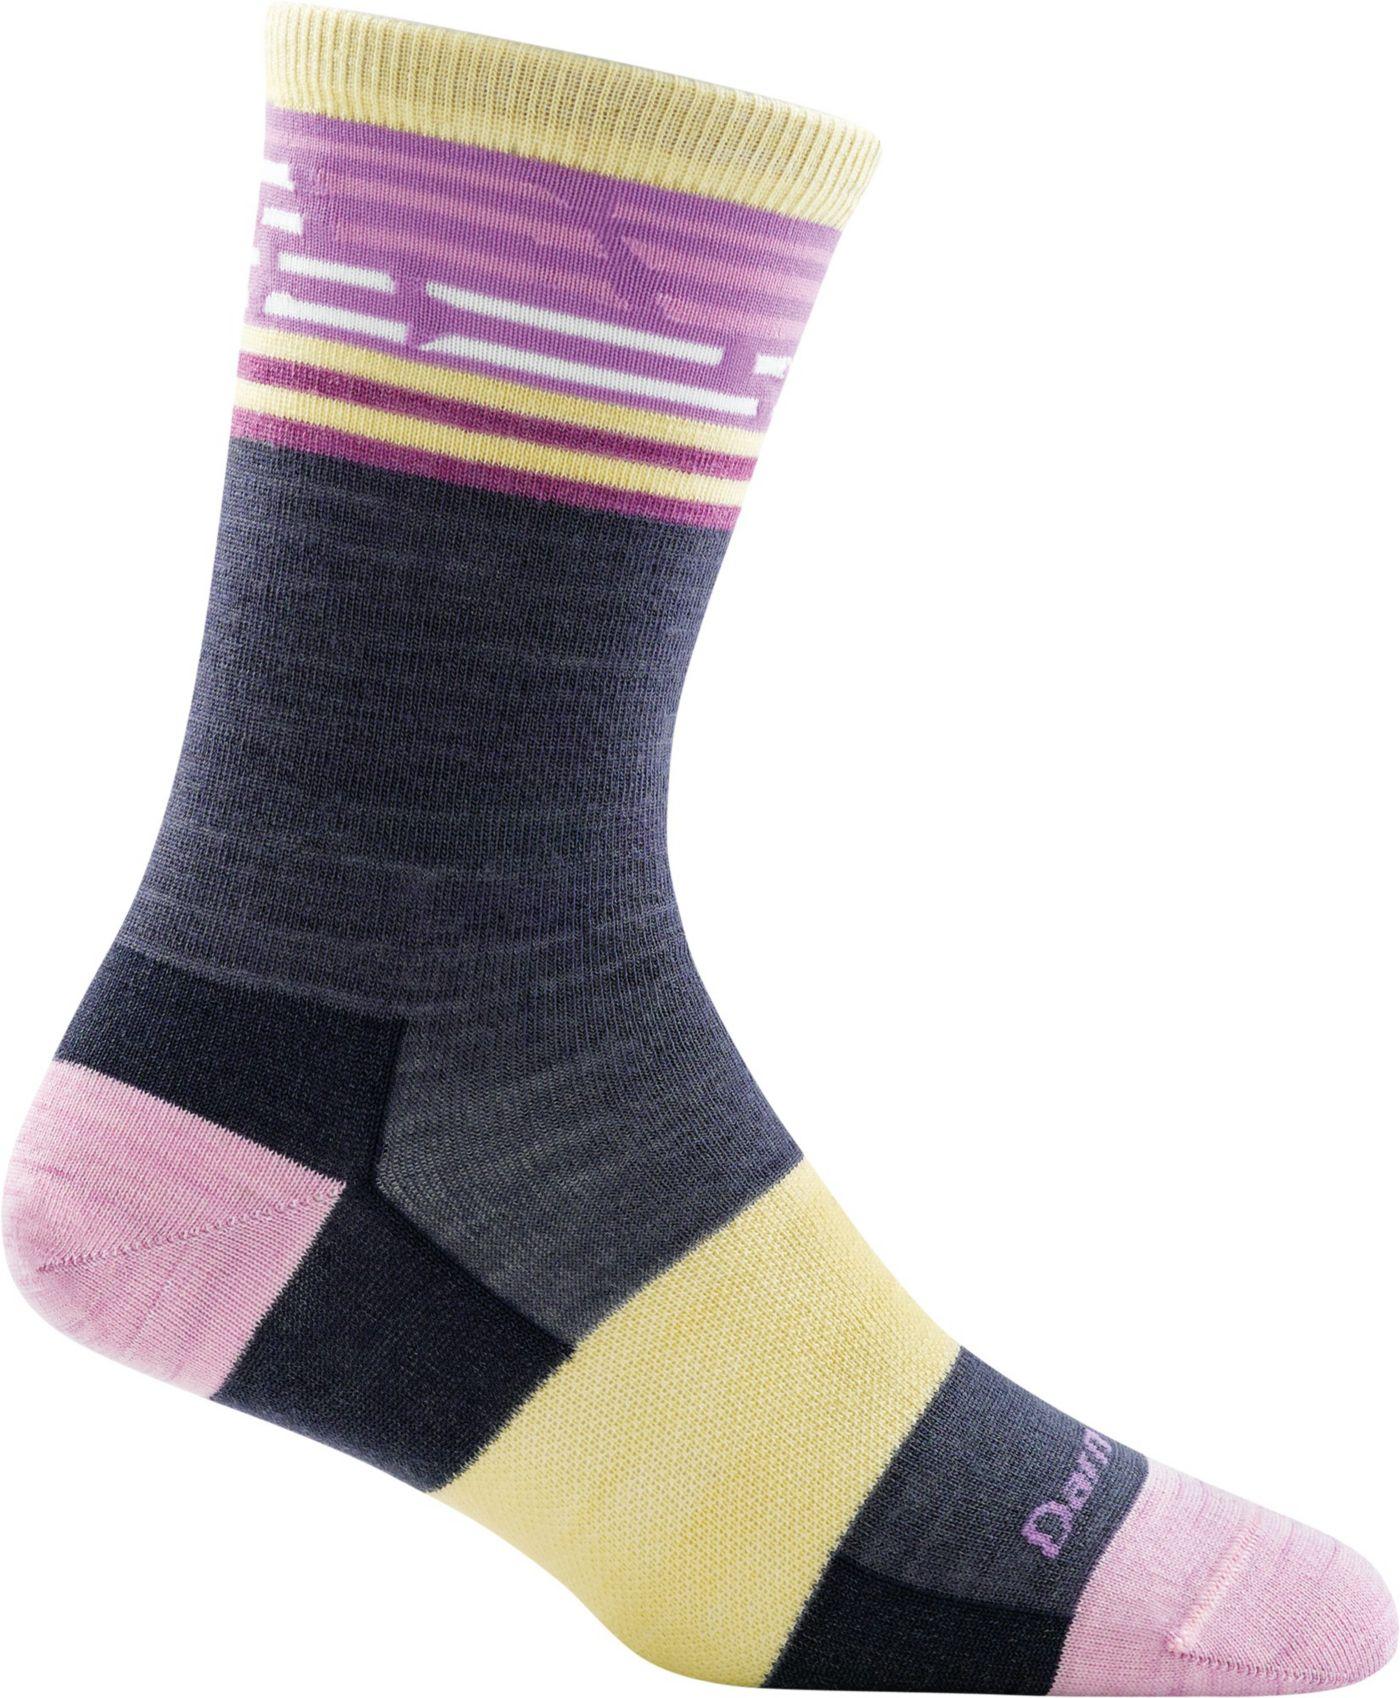 Darn Tough Women's Fraggle Crew Socks